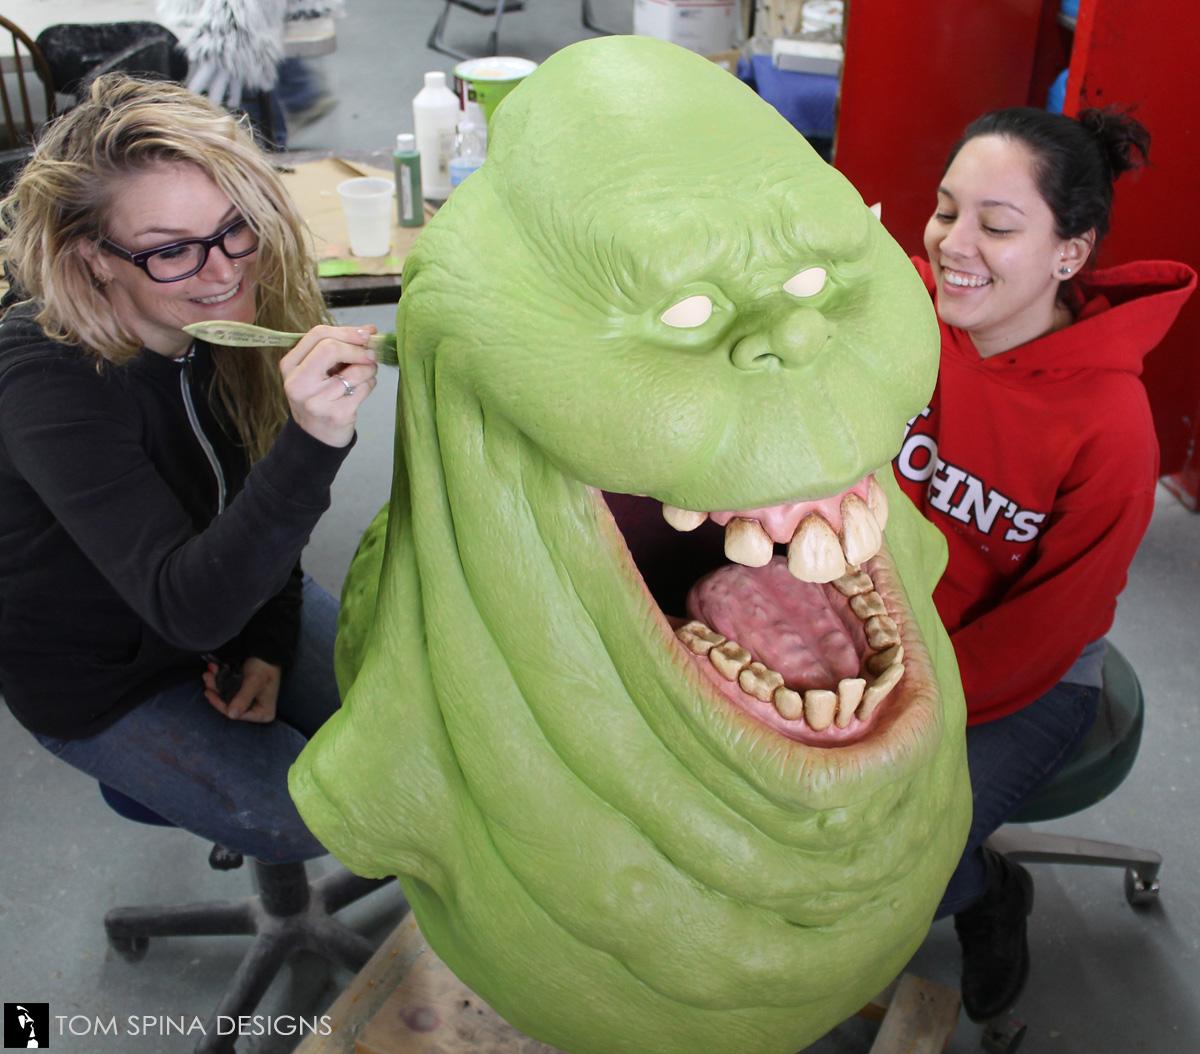 ghostbusters-slimer-lifesize-prop-statue-1_1.JPG